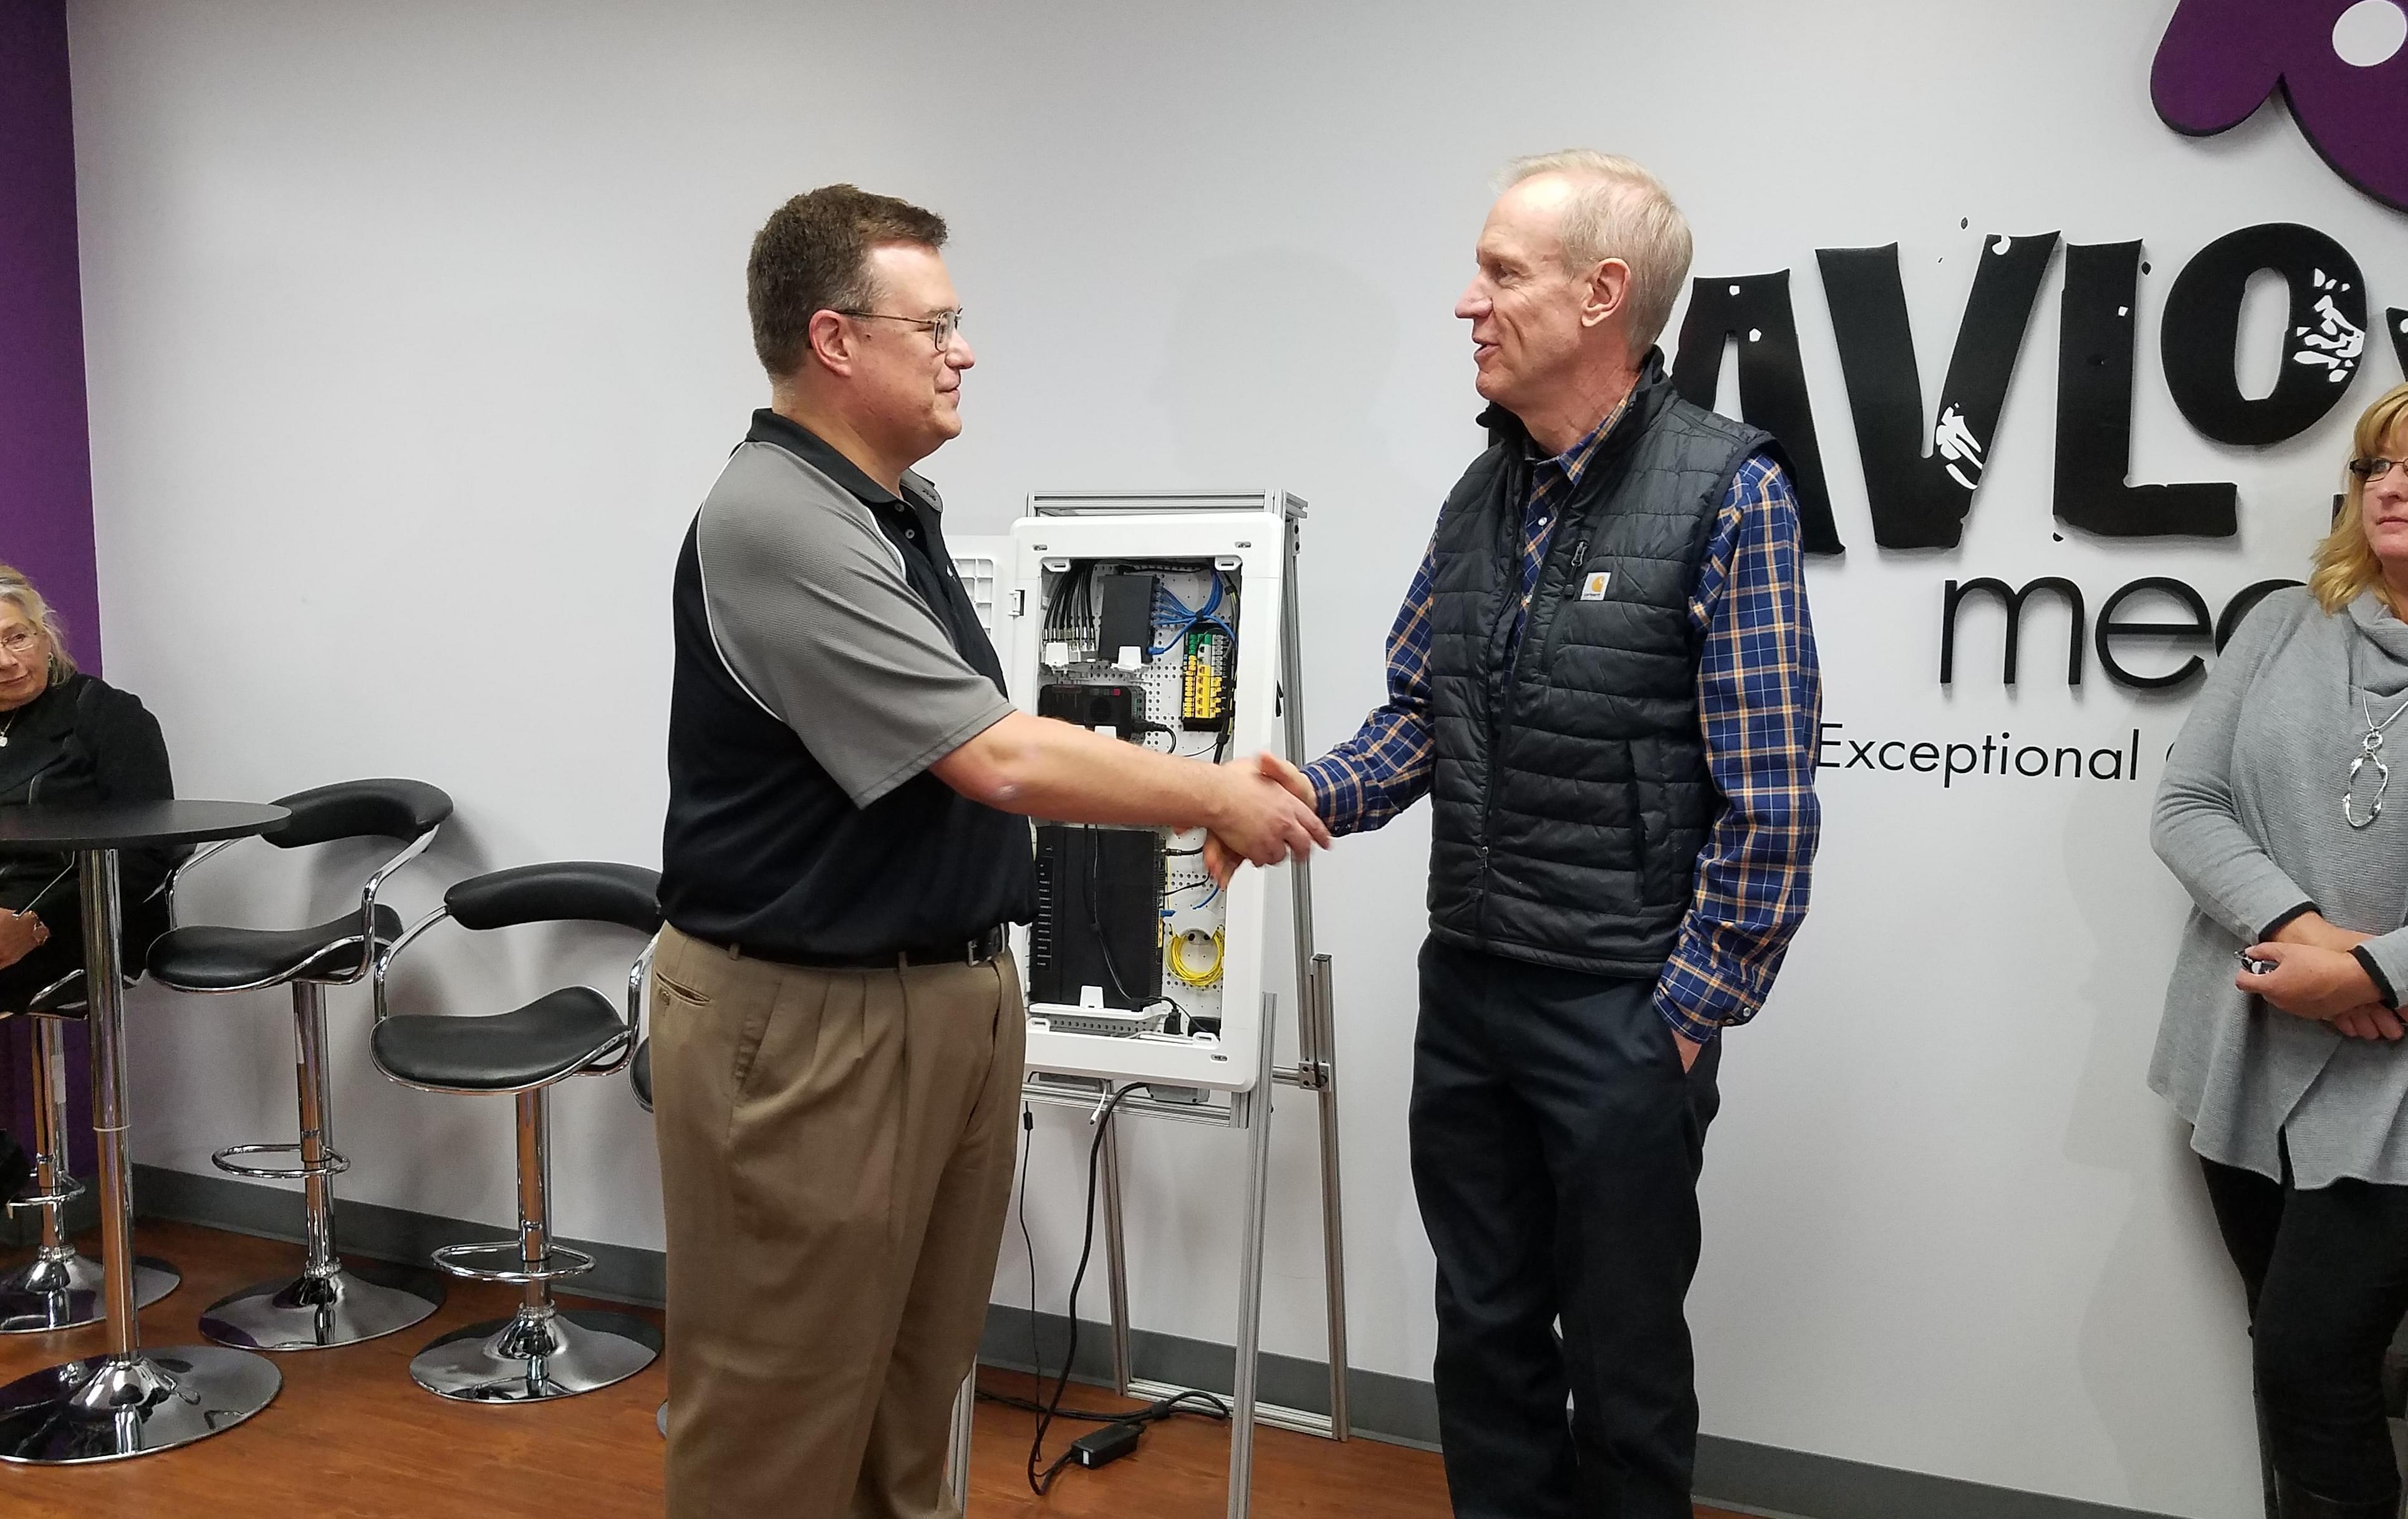 Pavlov Media CEO Mark Scifres and Gov. Bruce Rauner.